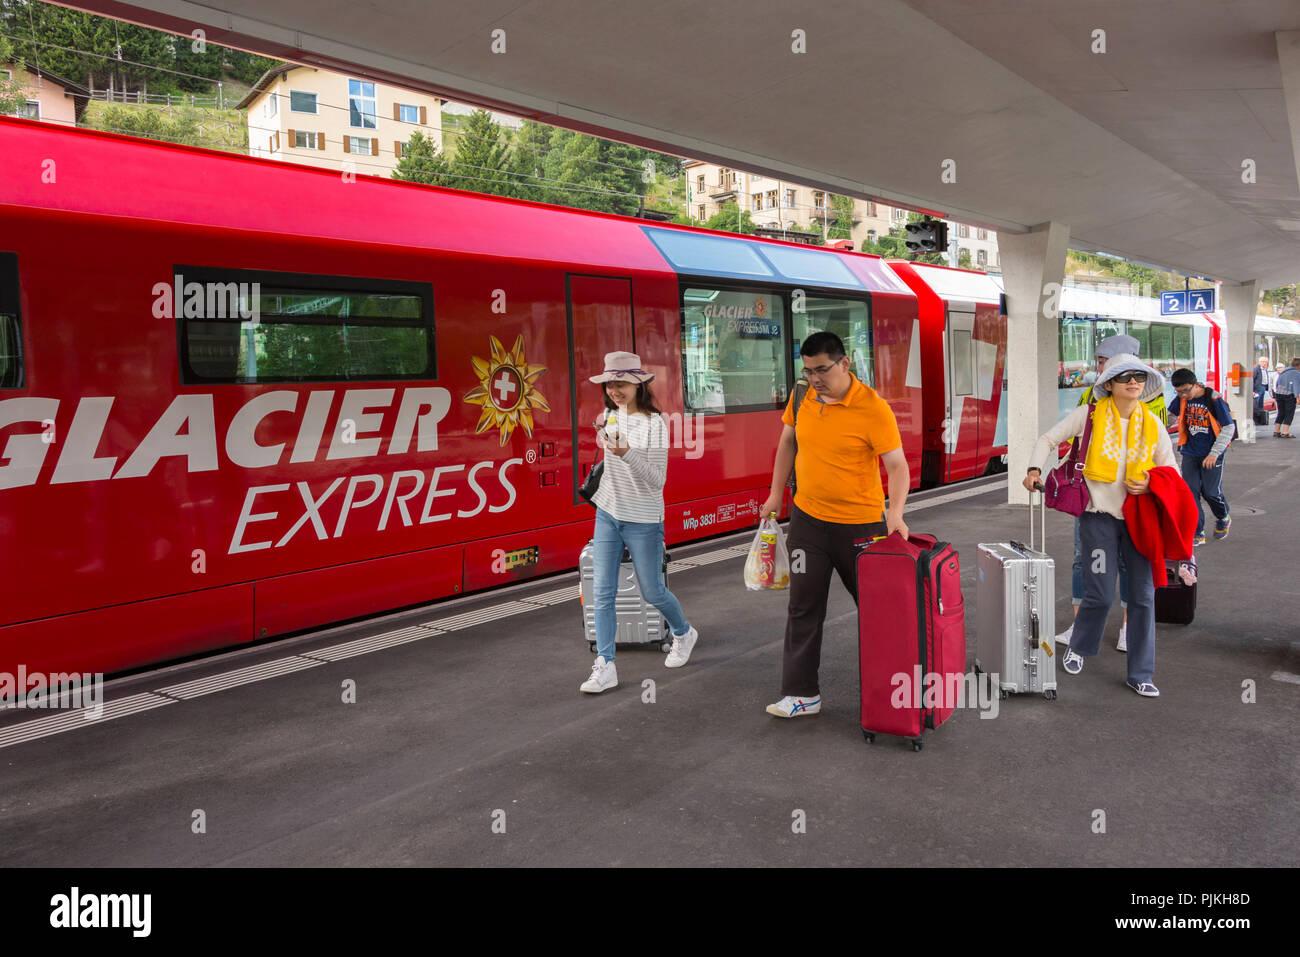 Glacier Express in the train station St. Moritz, Rhaetian Railway, Upper Engadin, Grisons, Switzerland - Stock Image